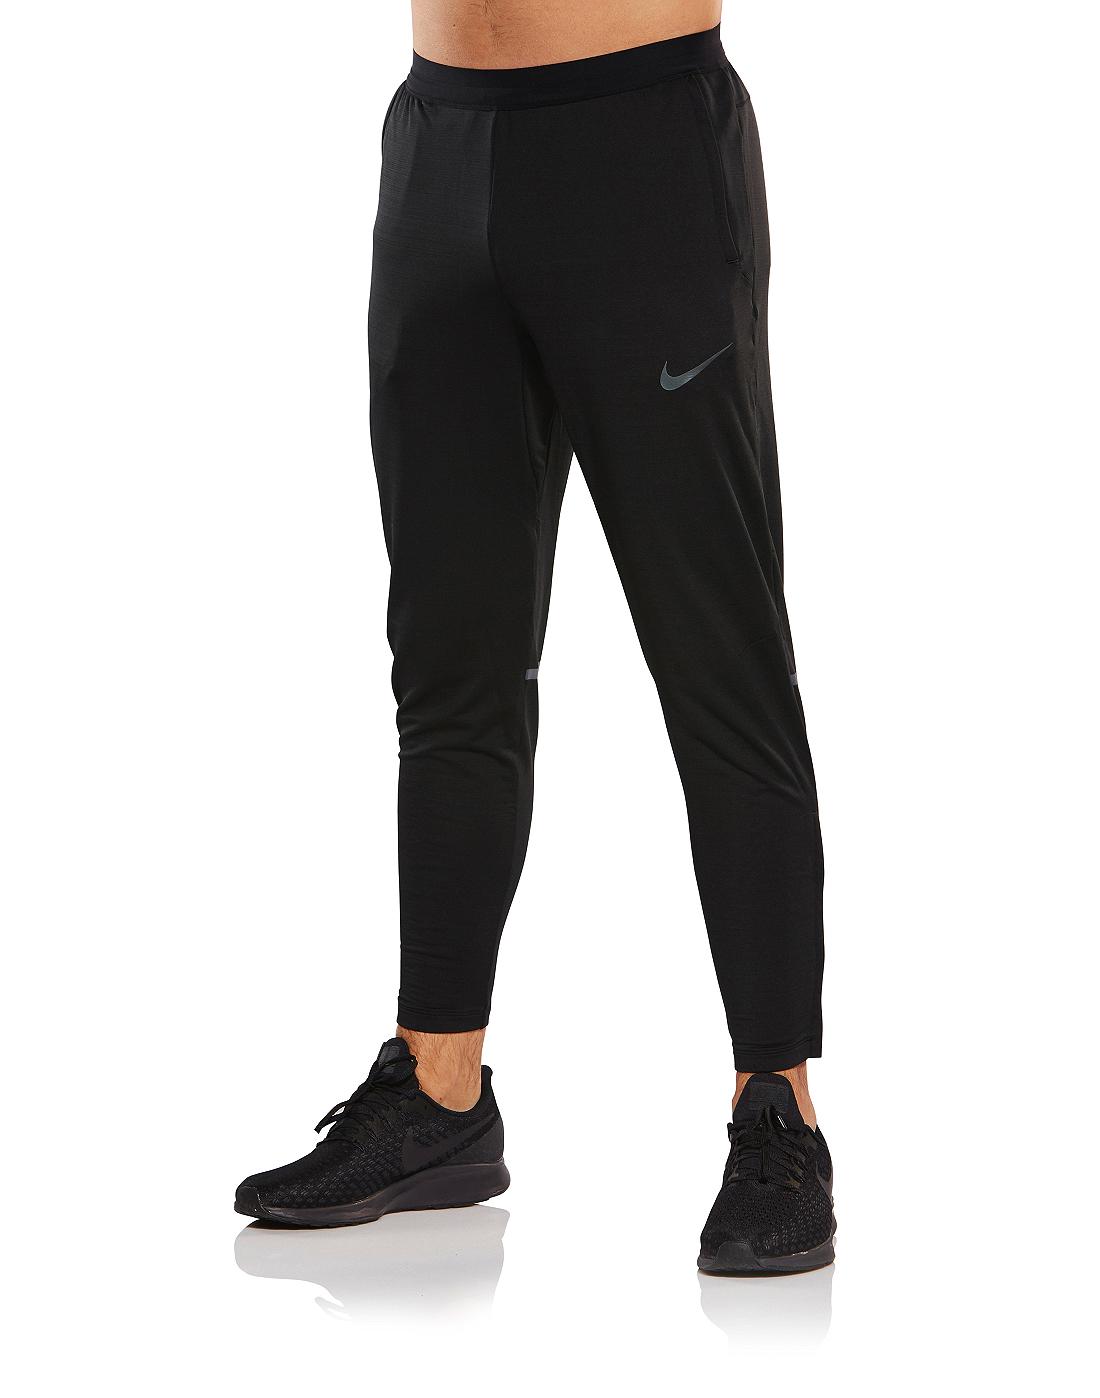 51cded851a91 Men s Nike Phenom Pants